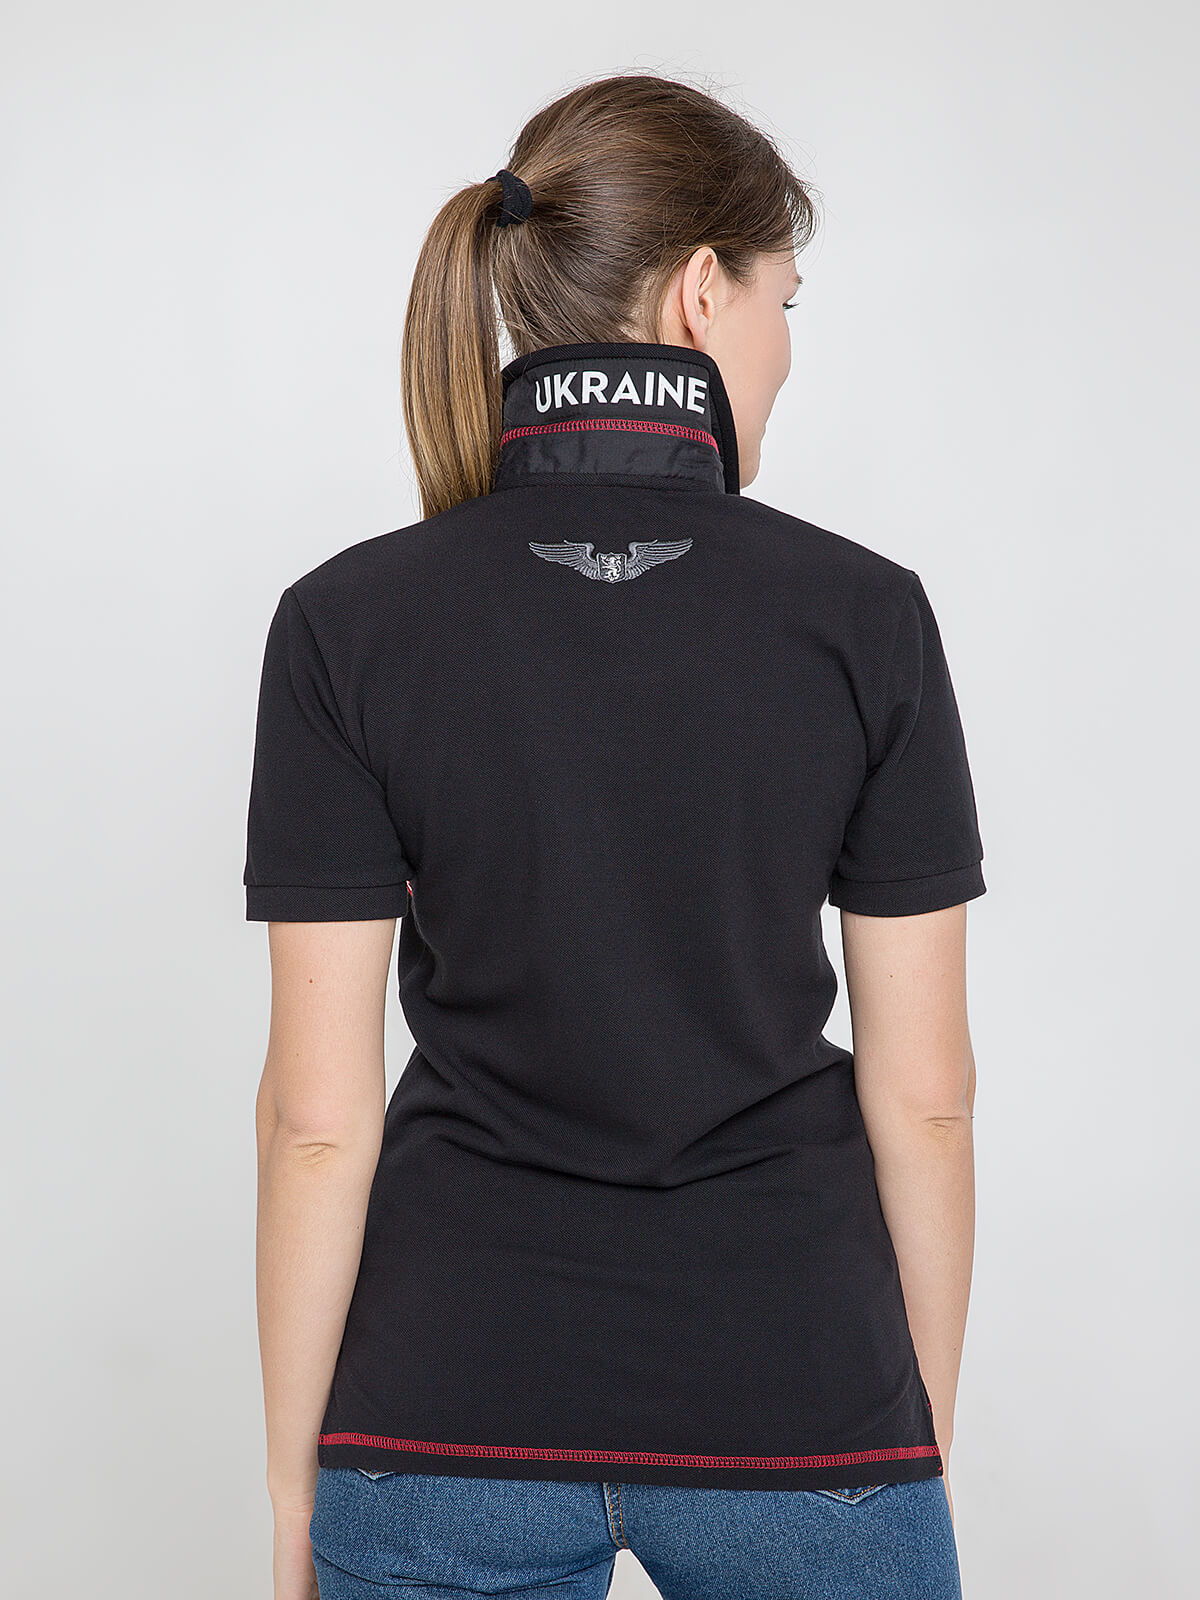 Women's Polo Shirt Wings. Color black.  Pique fabric: 100% cotton.